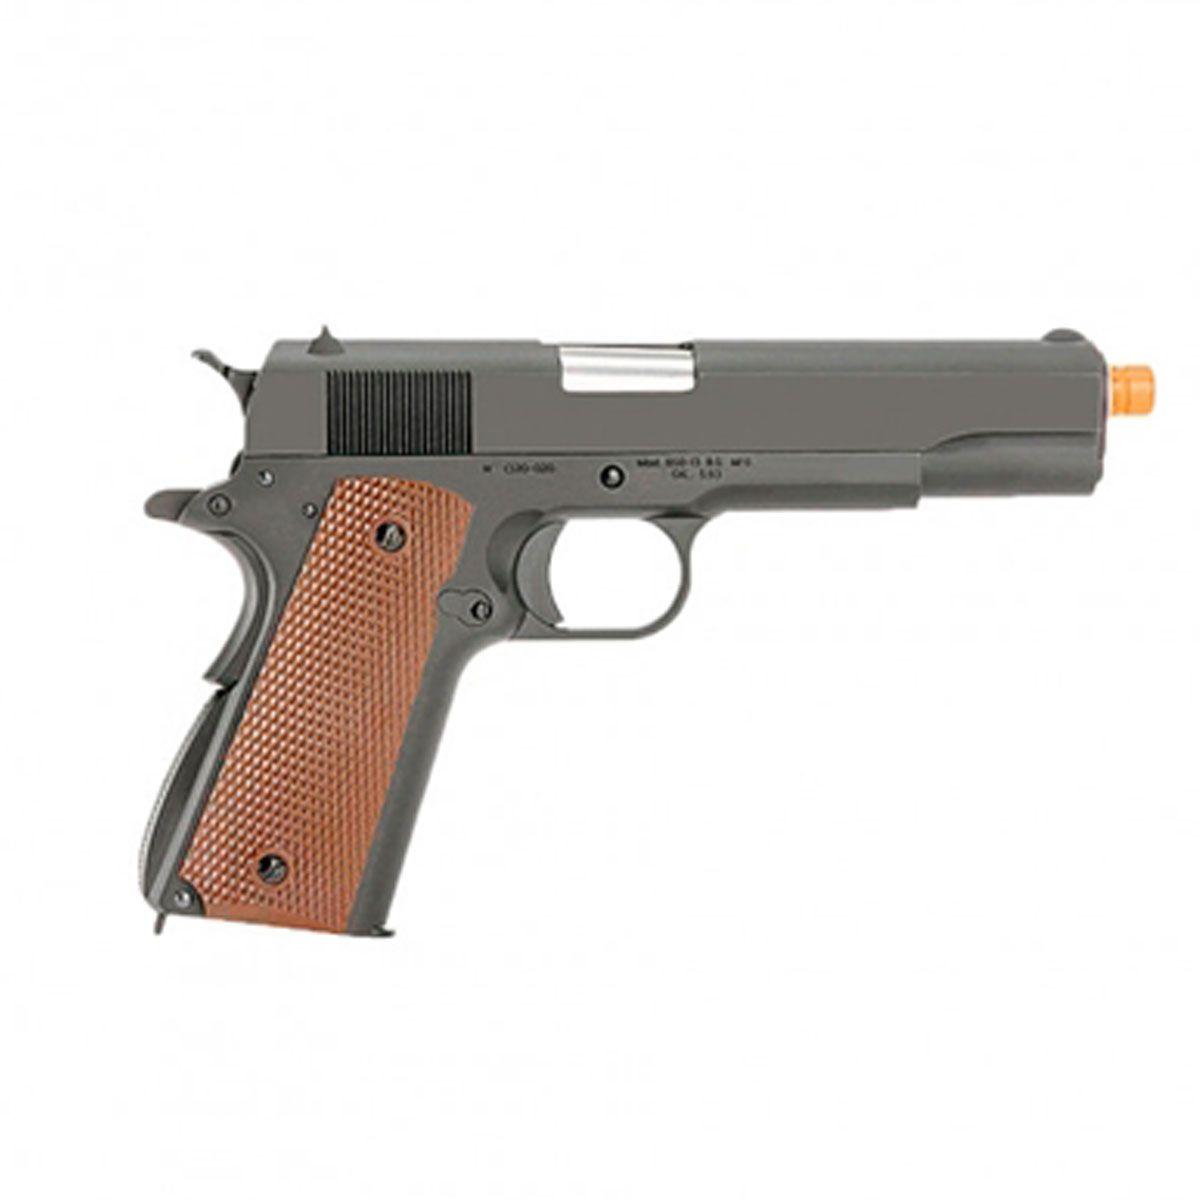 Pistola Airsoft 1911 A-Version Gen 2 Full Metal GBB - WE